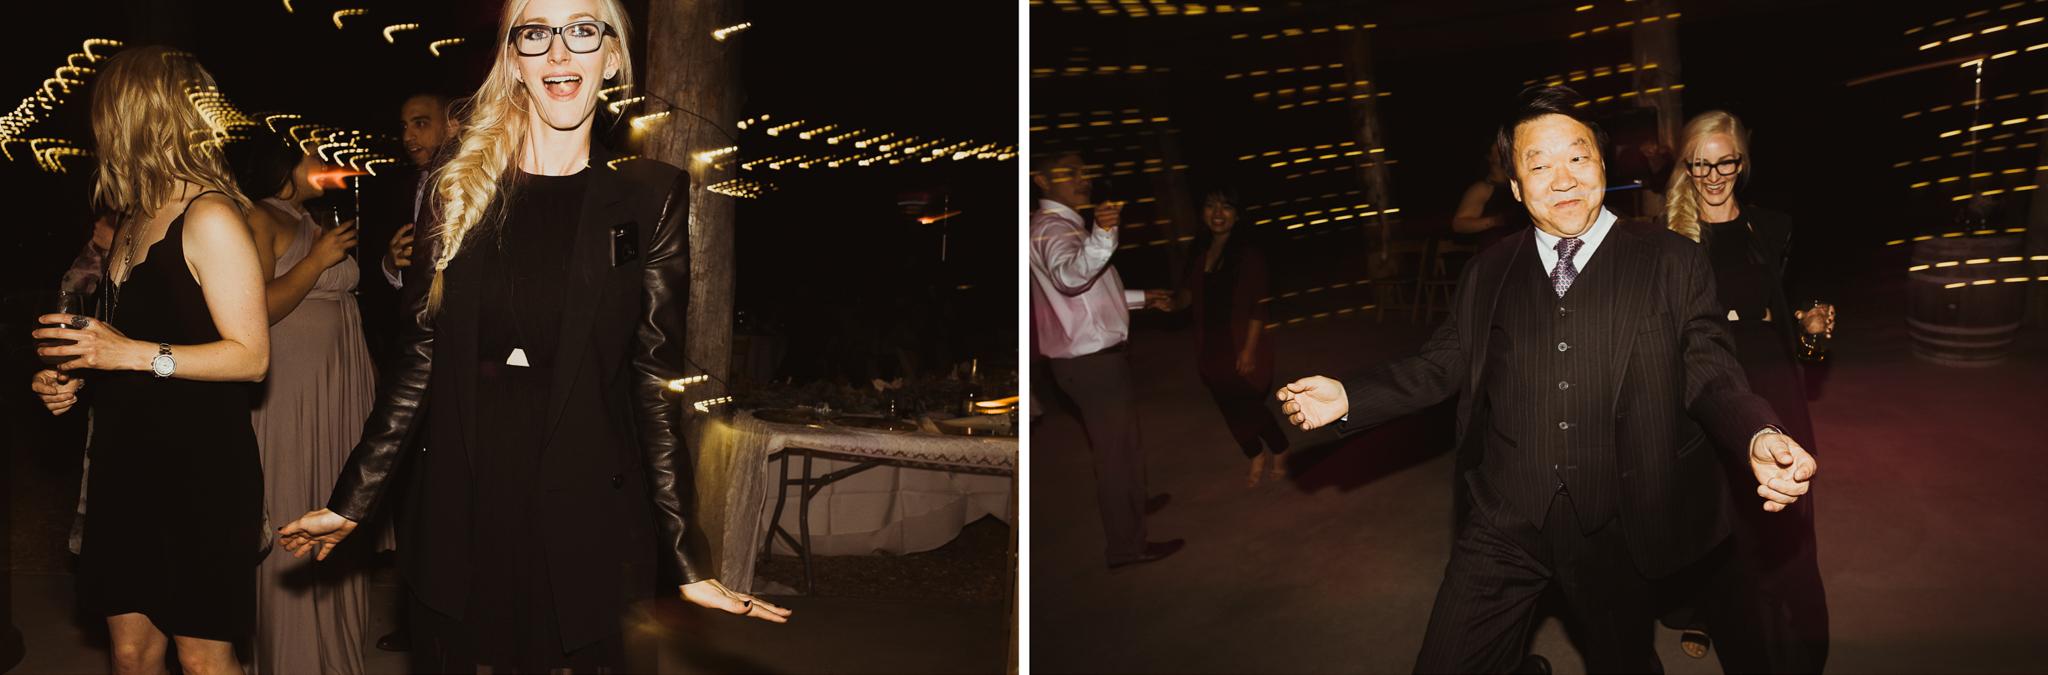 ©Isaiah & Taylor Photography - The Hideout, Kirkwood CA wedding -11.jpg